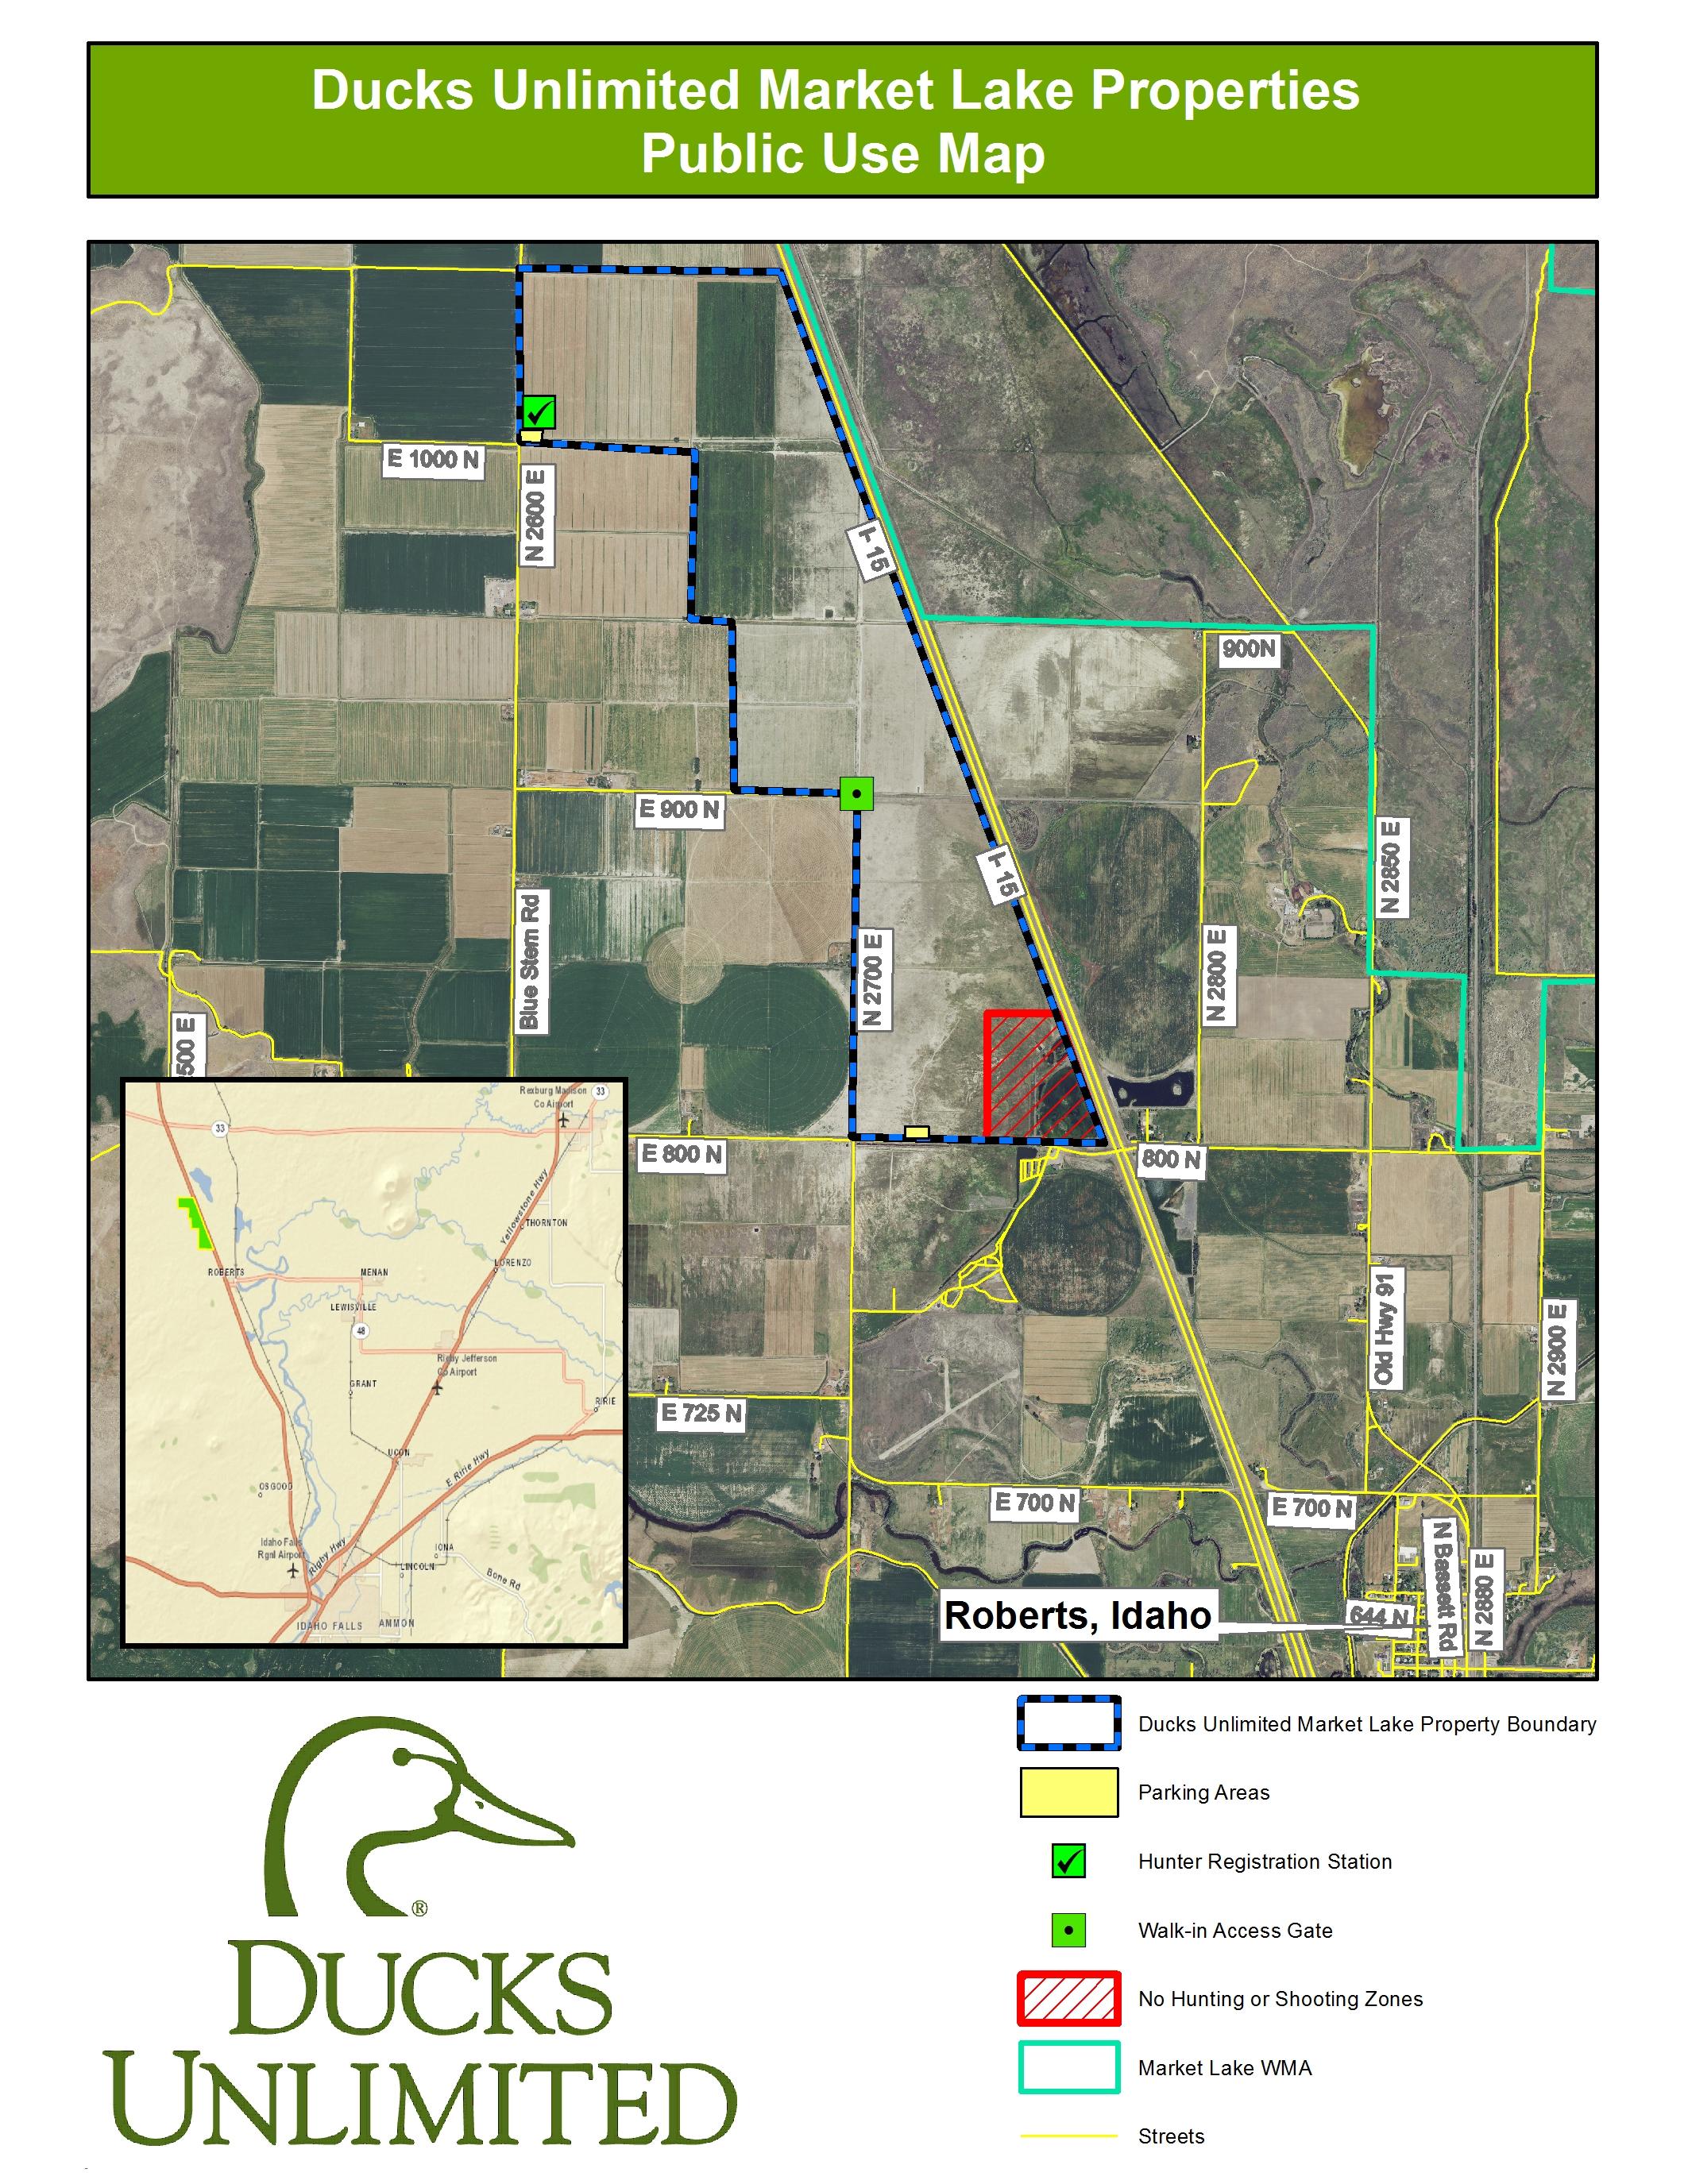 Mississippi Ducks Unlimited Migration Map